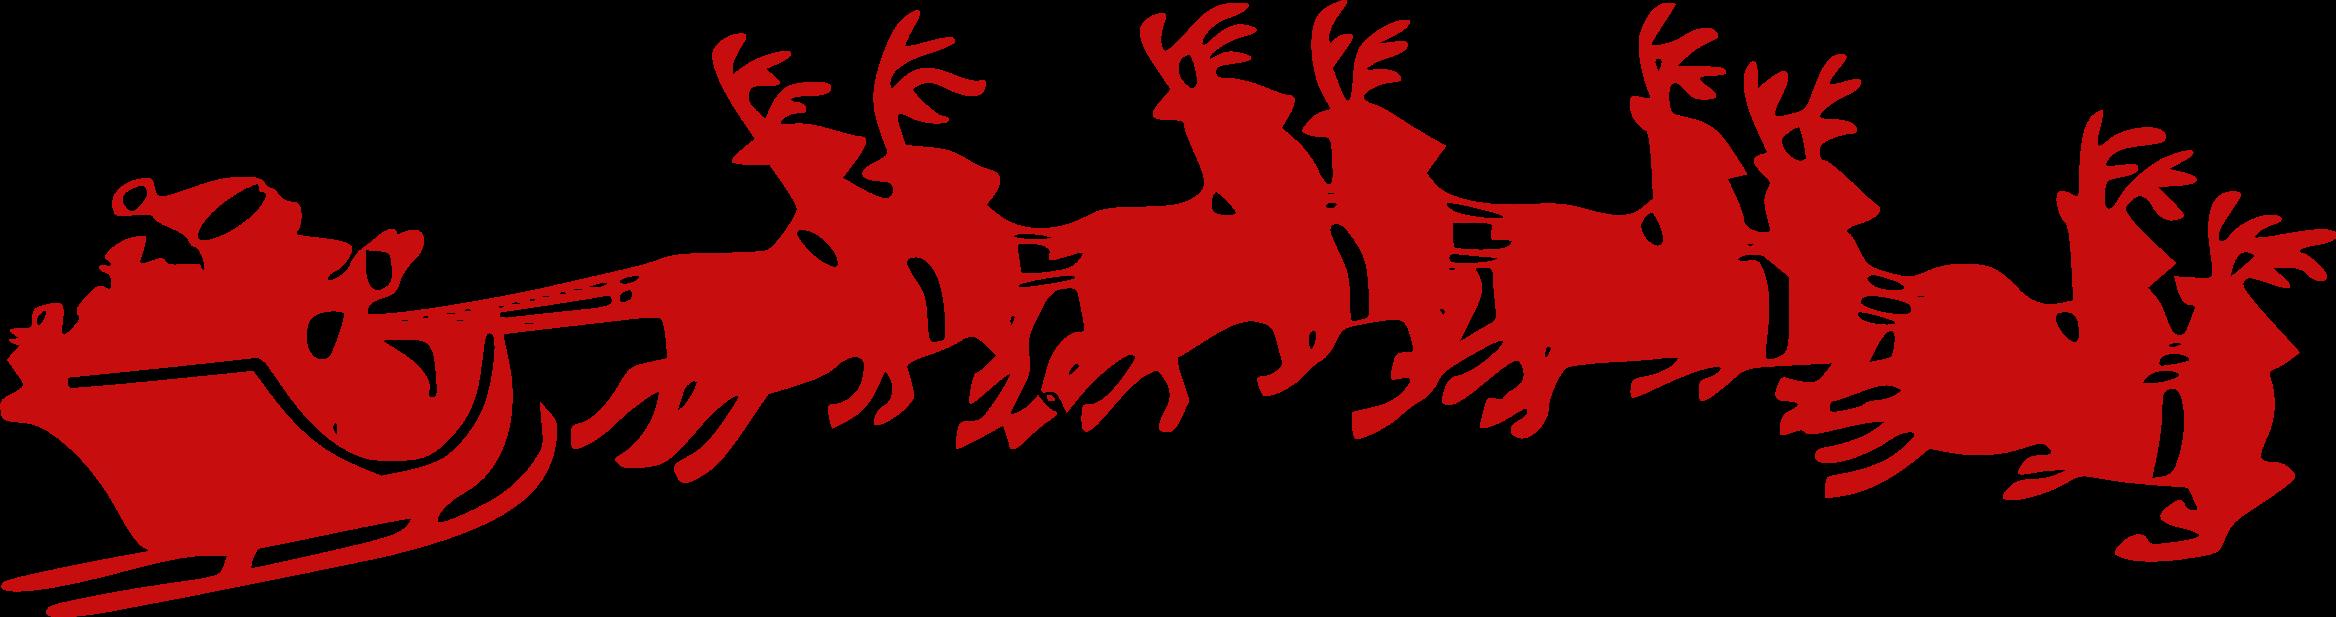 Sleigh clipart santa sleigh Sleigh Sleigh Santa's Santa's Clipart